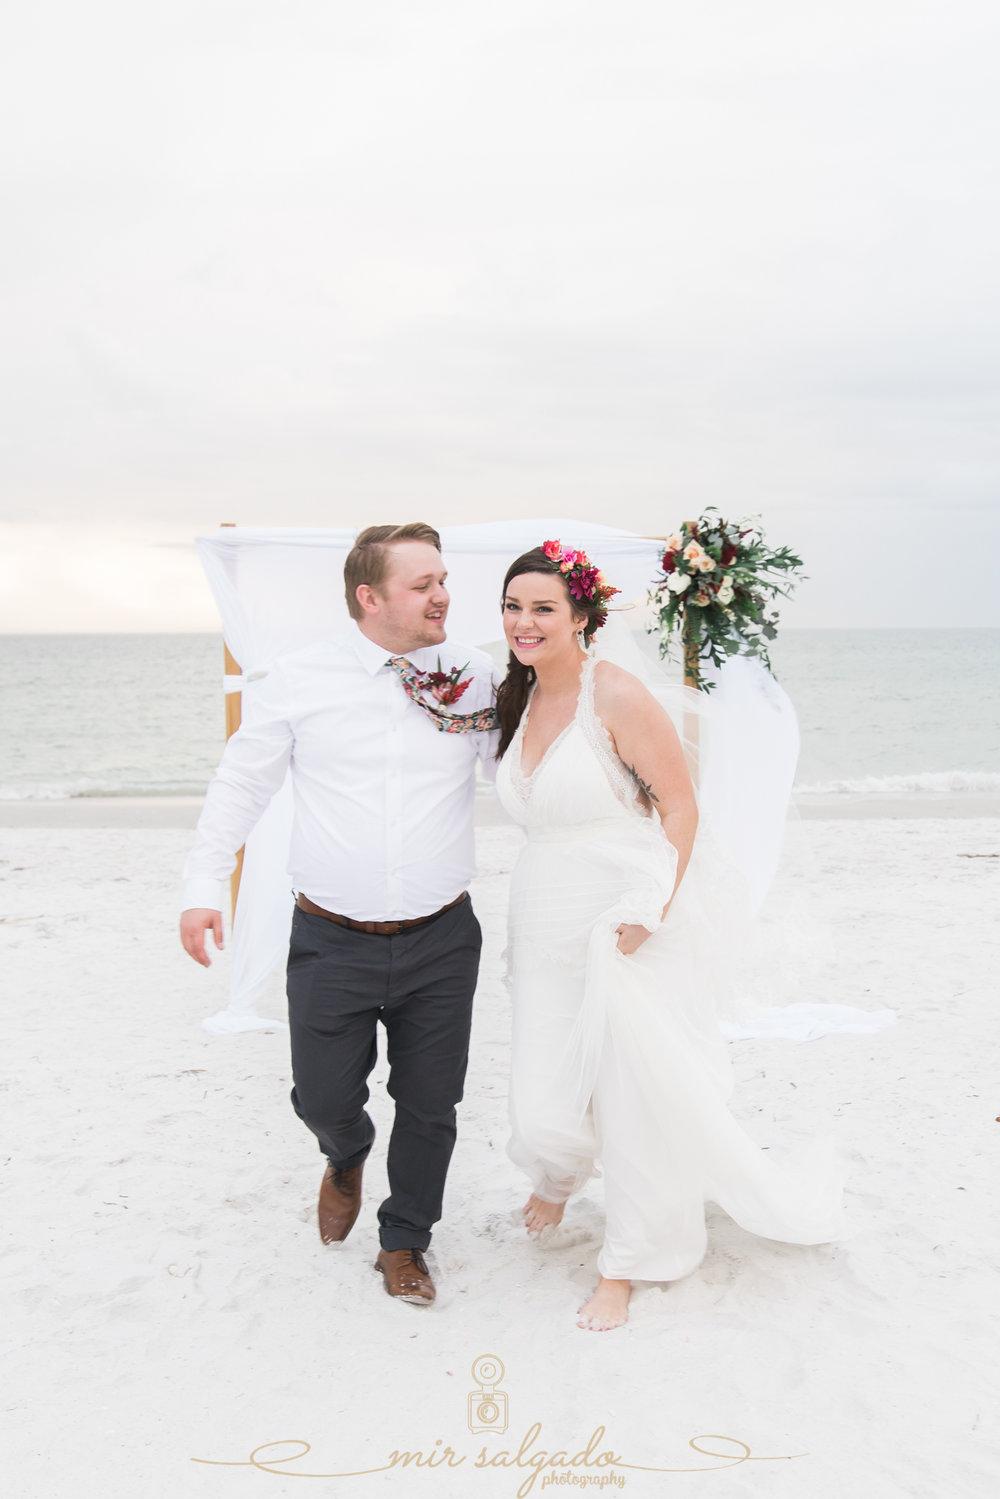 St.Pete-wedding-photo, St.Pete-beach-wedding-photo